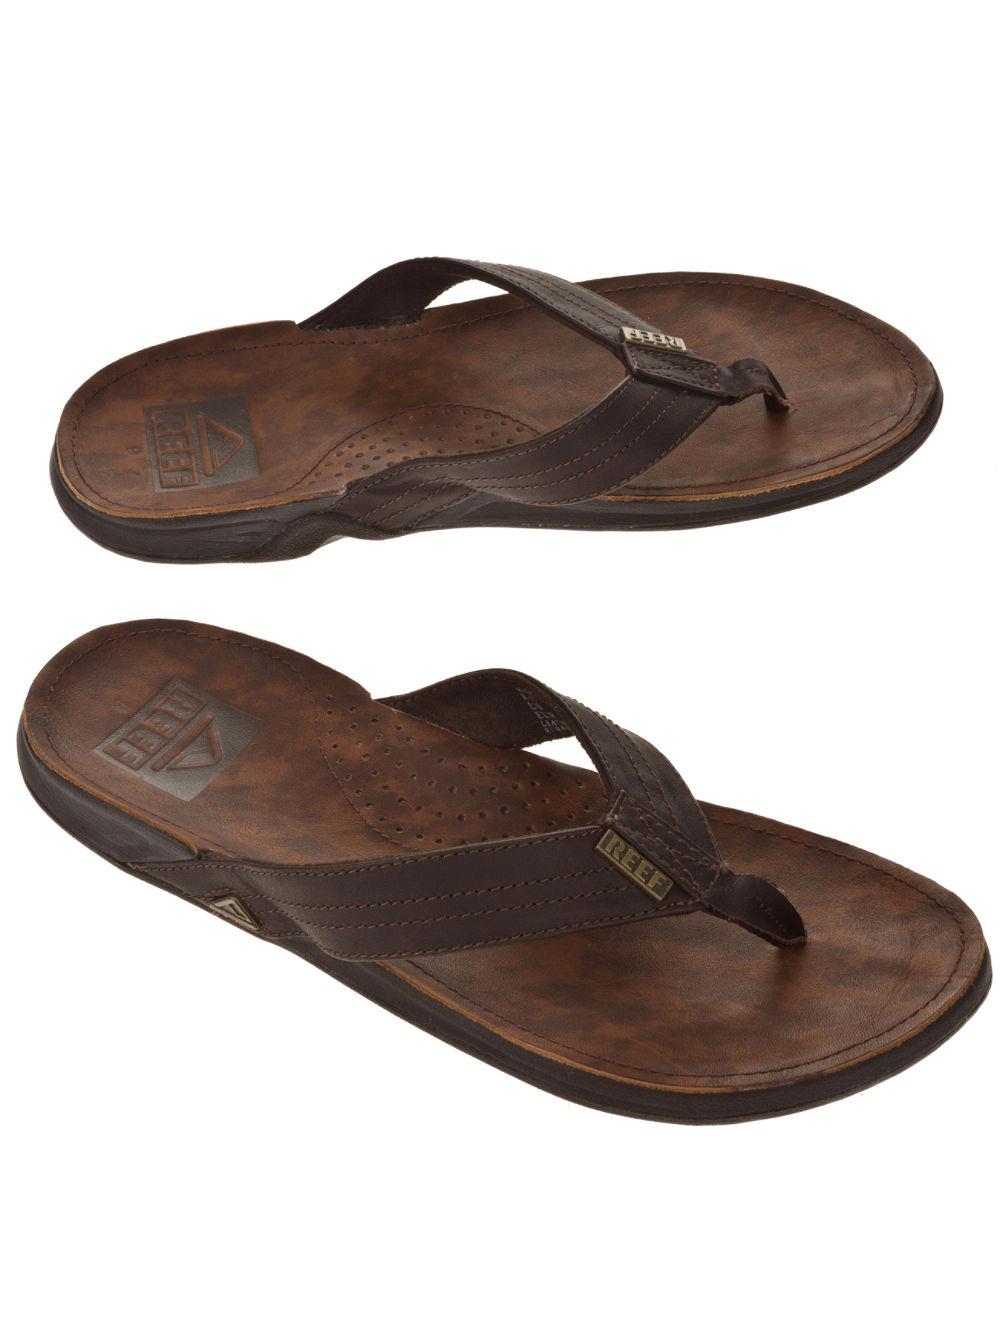 ... Hommes Chaussures Claquettes   Tongs. Réduc. J-Bay III Sandales. Reef e055c256099e